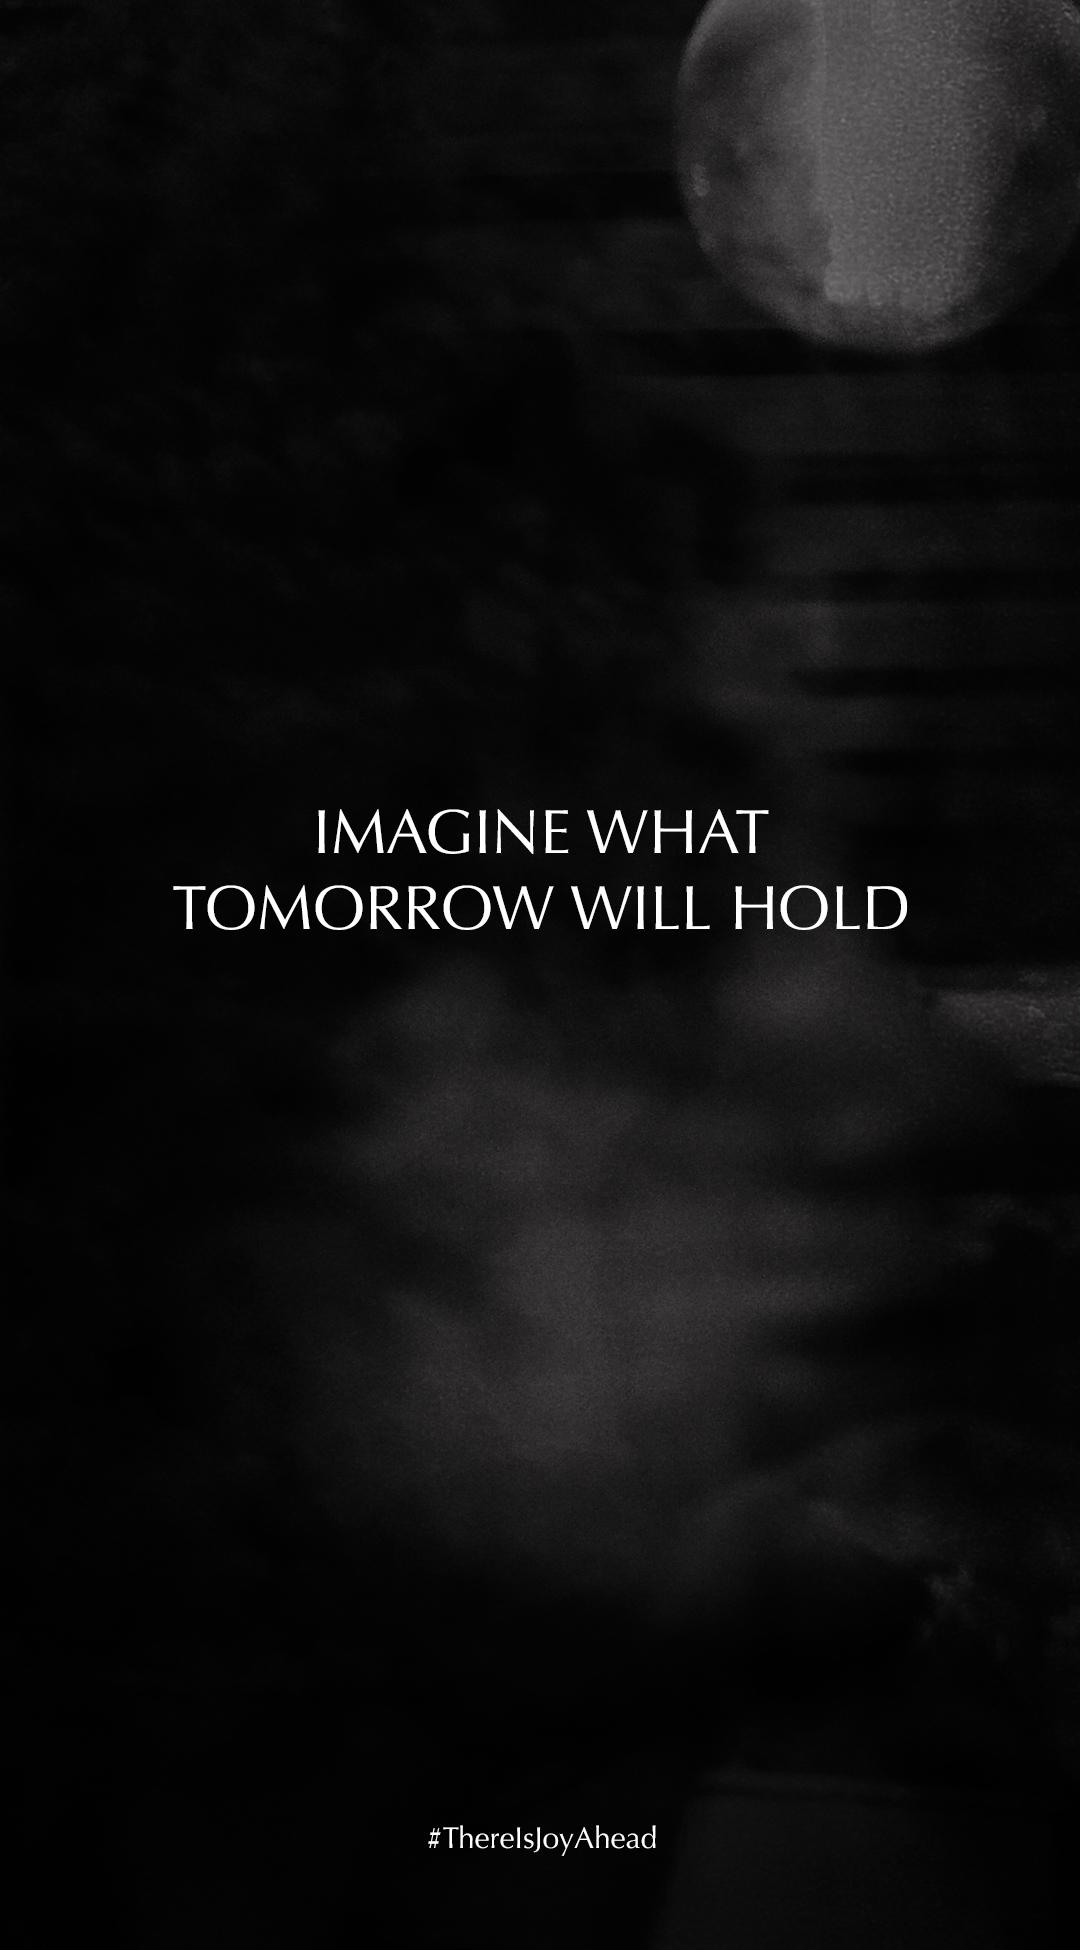 Tomorrow - 1080x1920 (JPG)